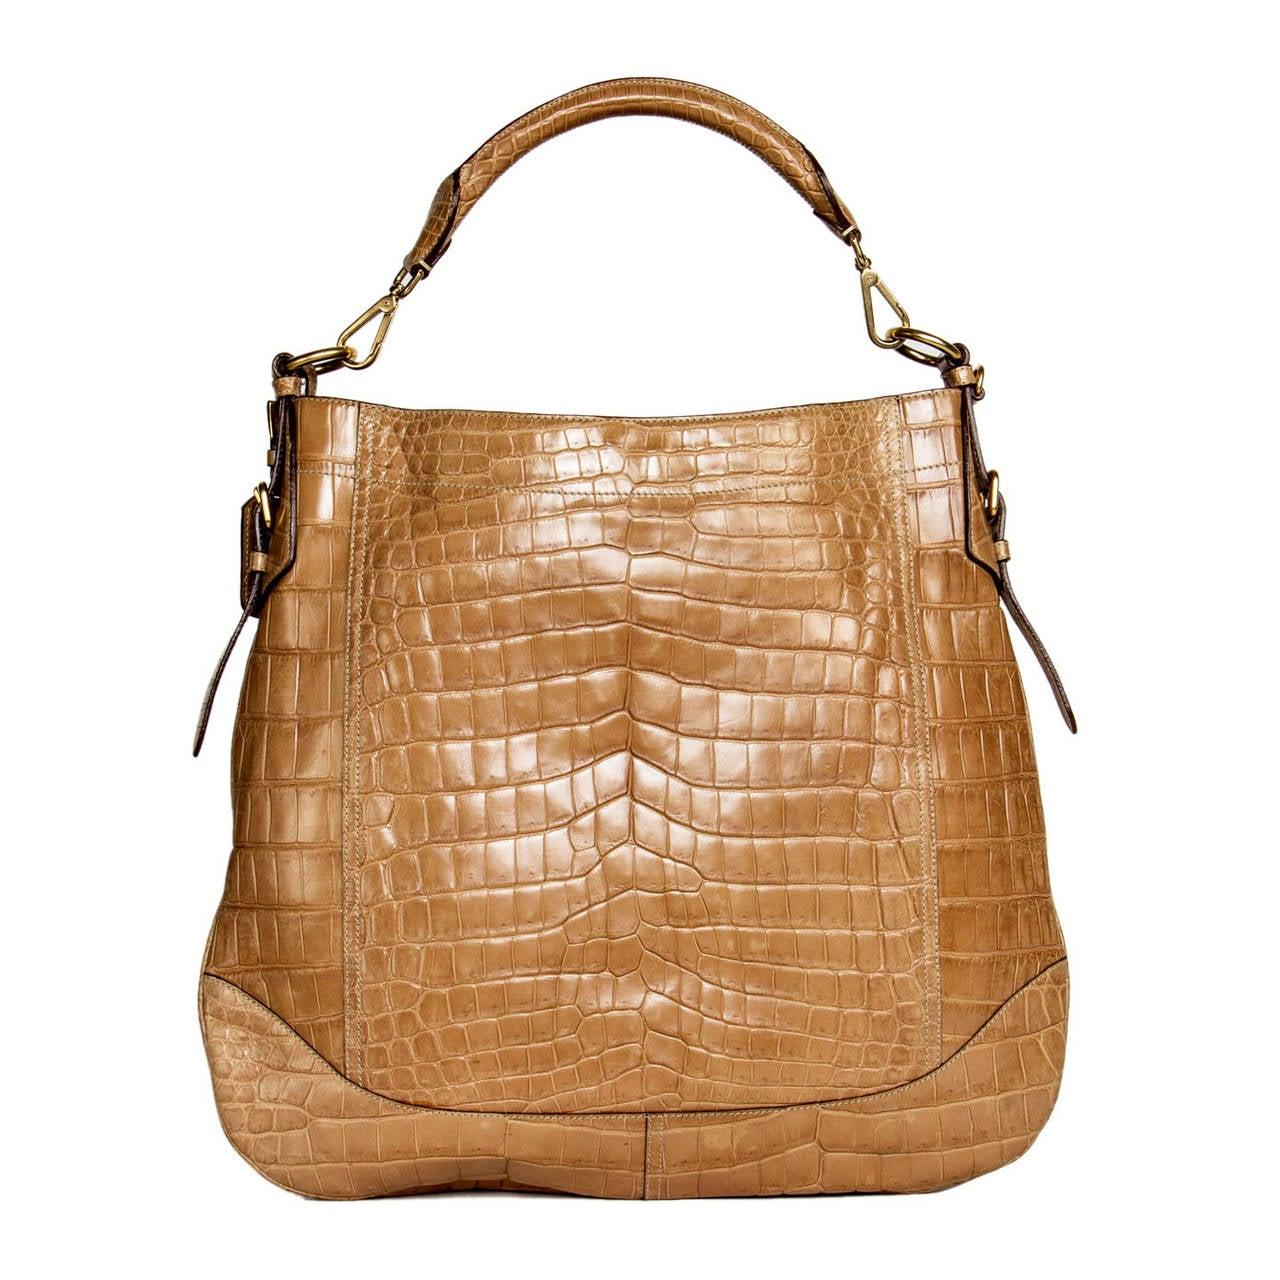 bag prada red - prada crocodile handbag